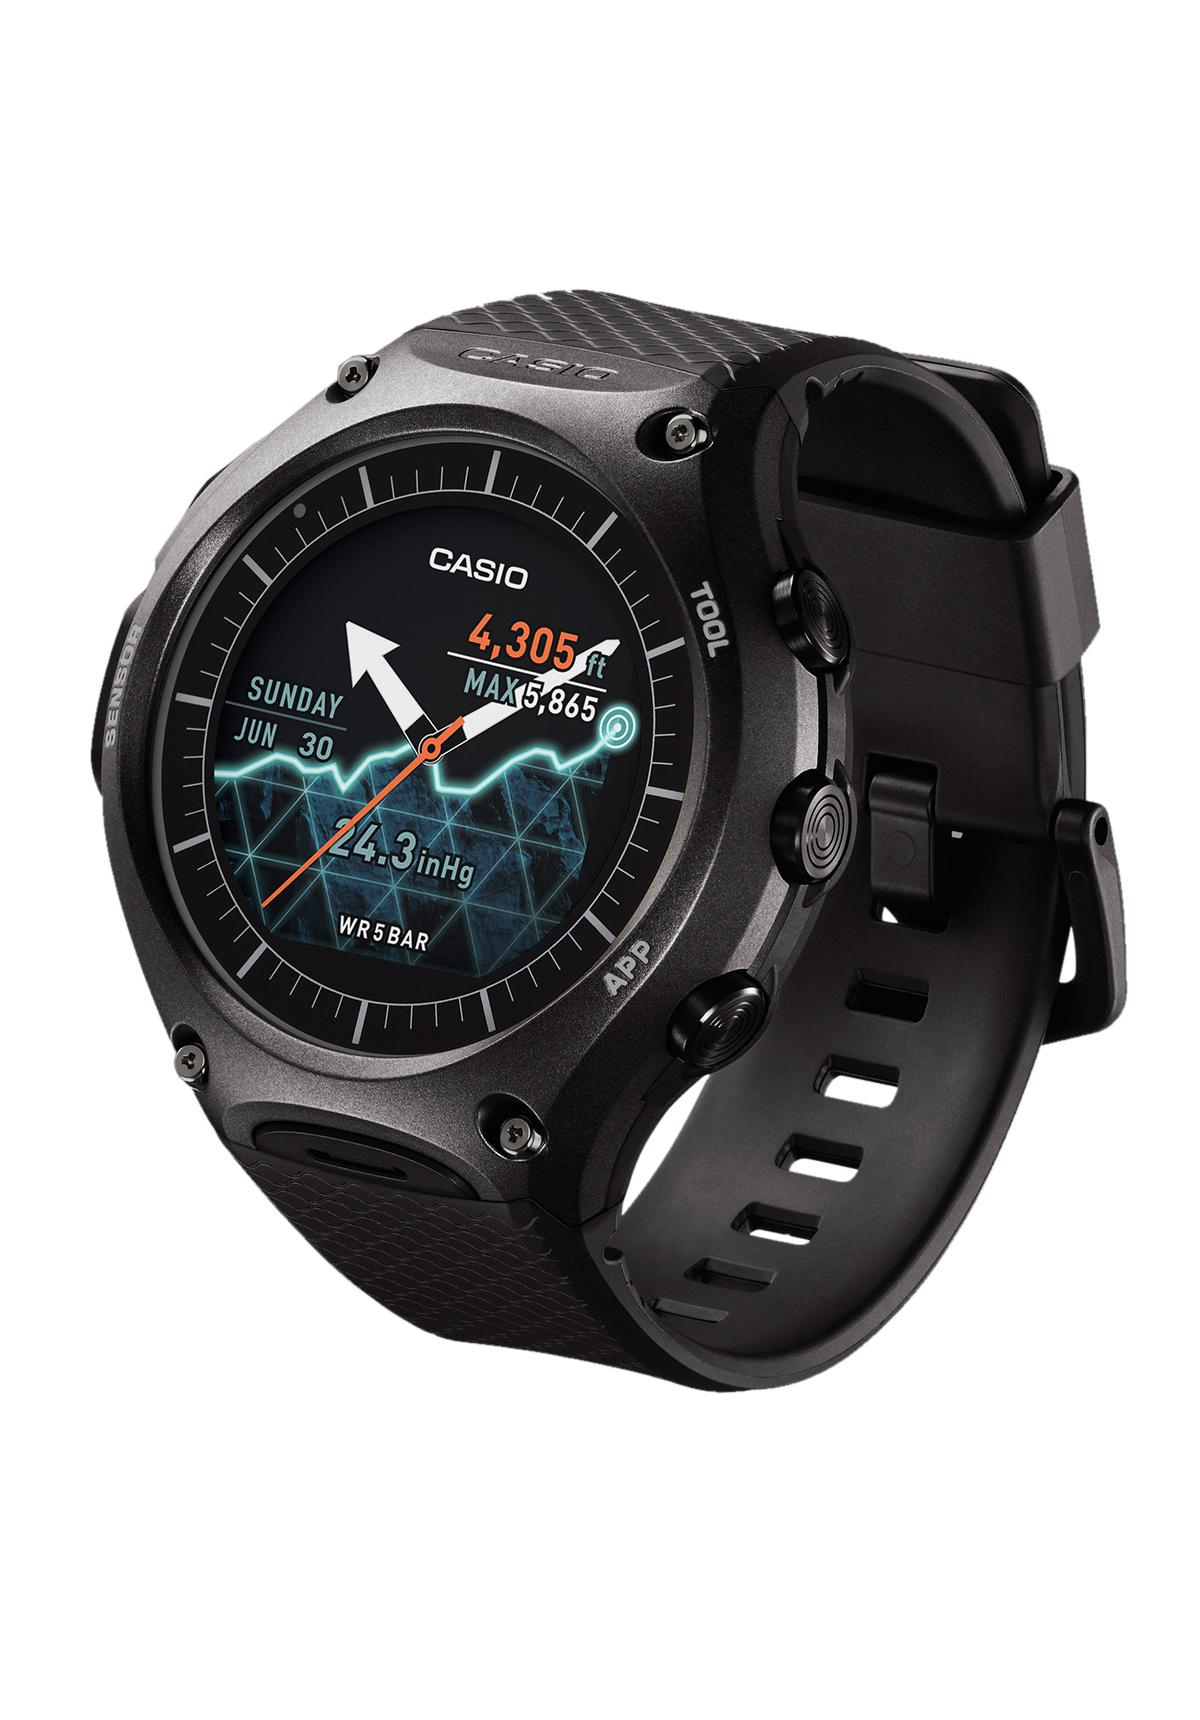 casio smart outdoor watch wsd f10bkaae nur 359 00. Black Bedroom Furniture Sets. Home Design Ideas